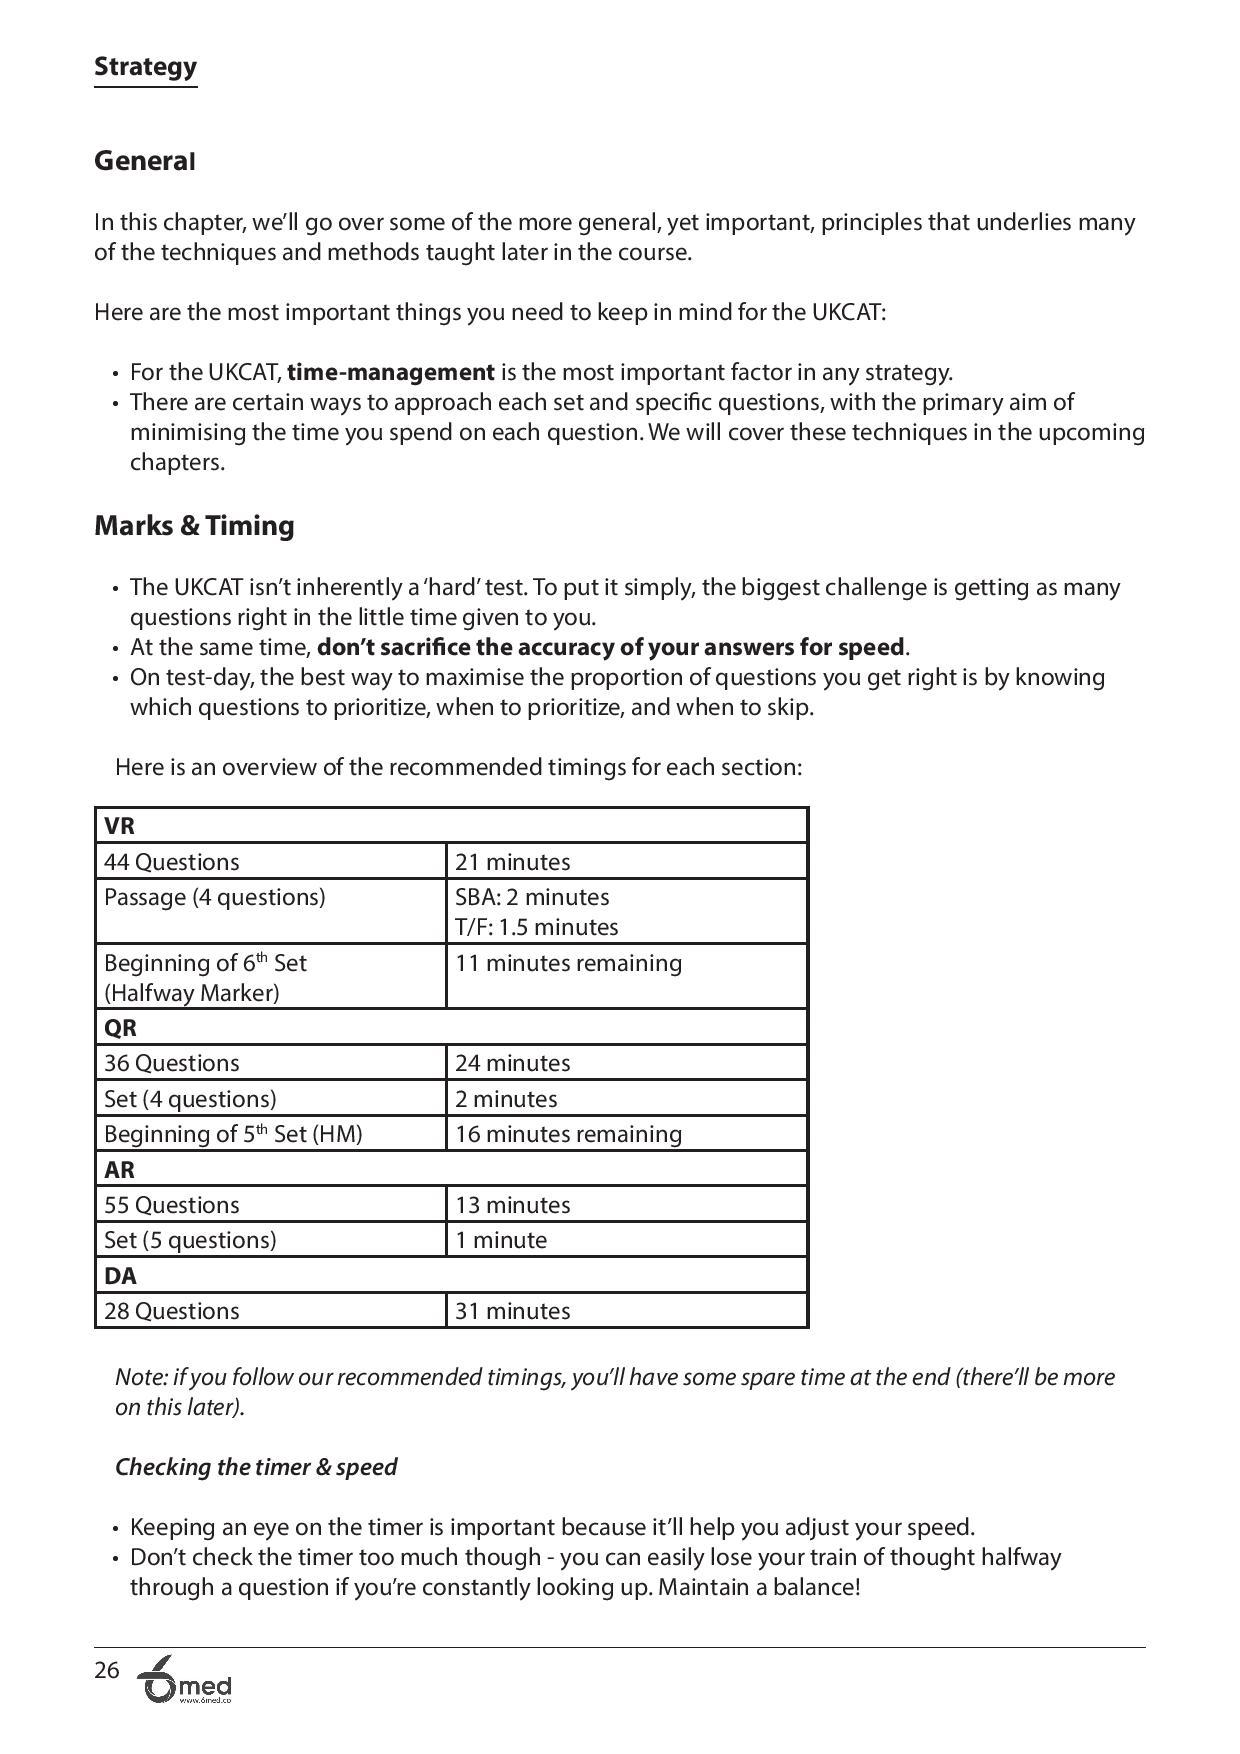 UKCAT Crash Course Handbook page 26